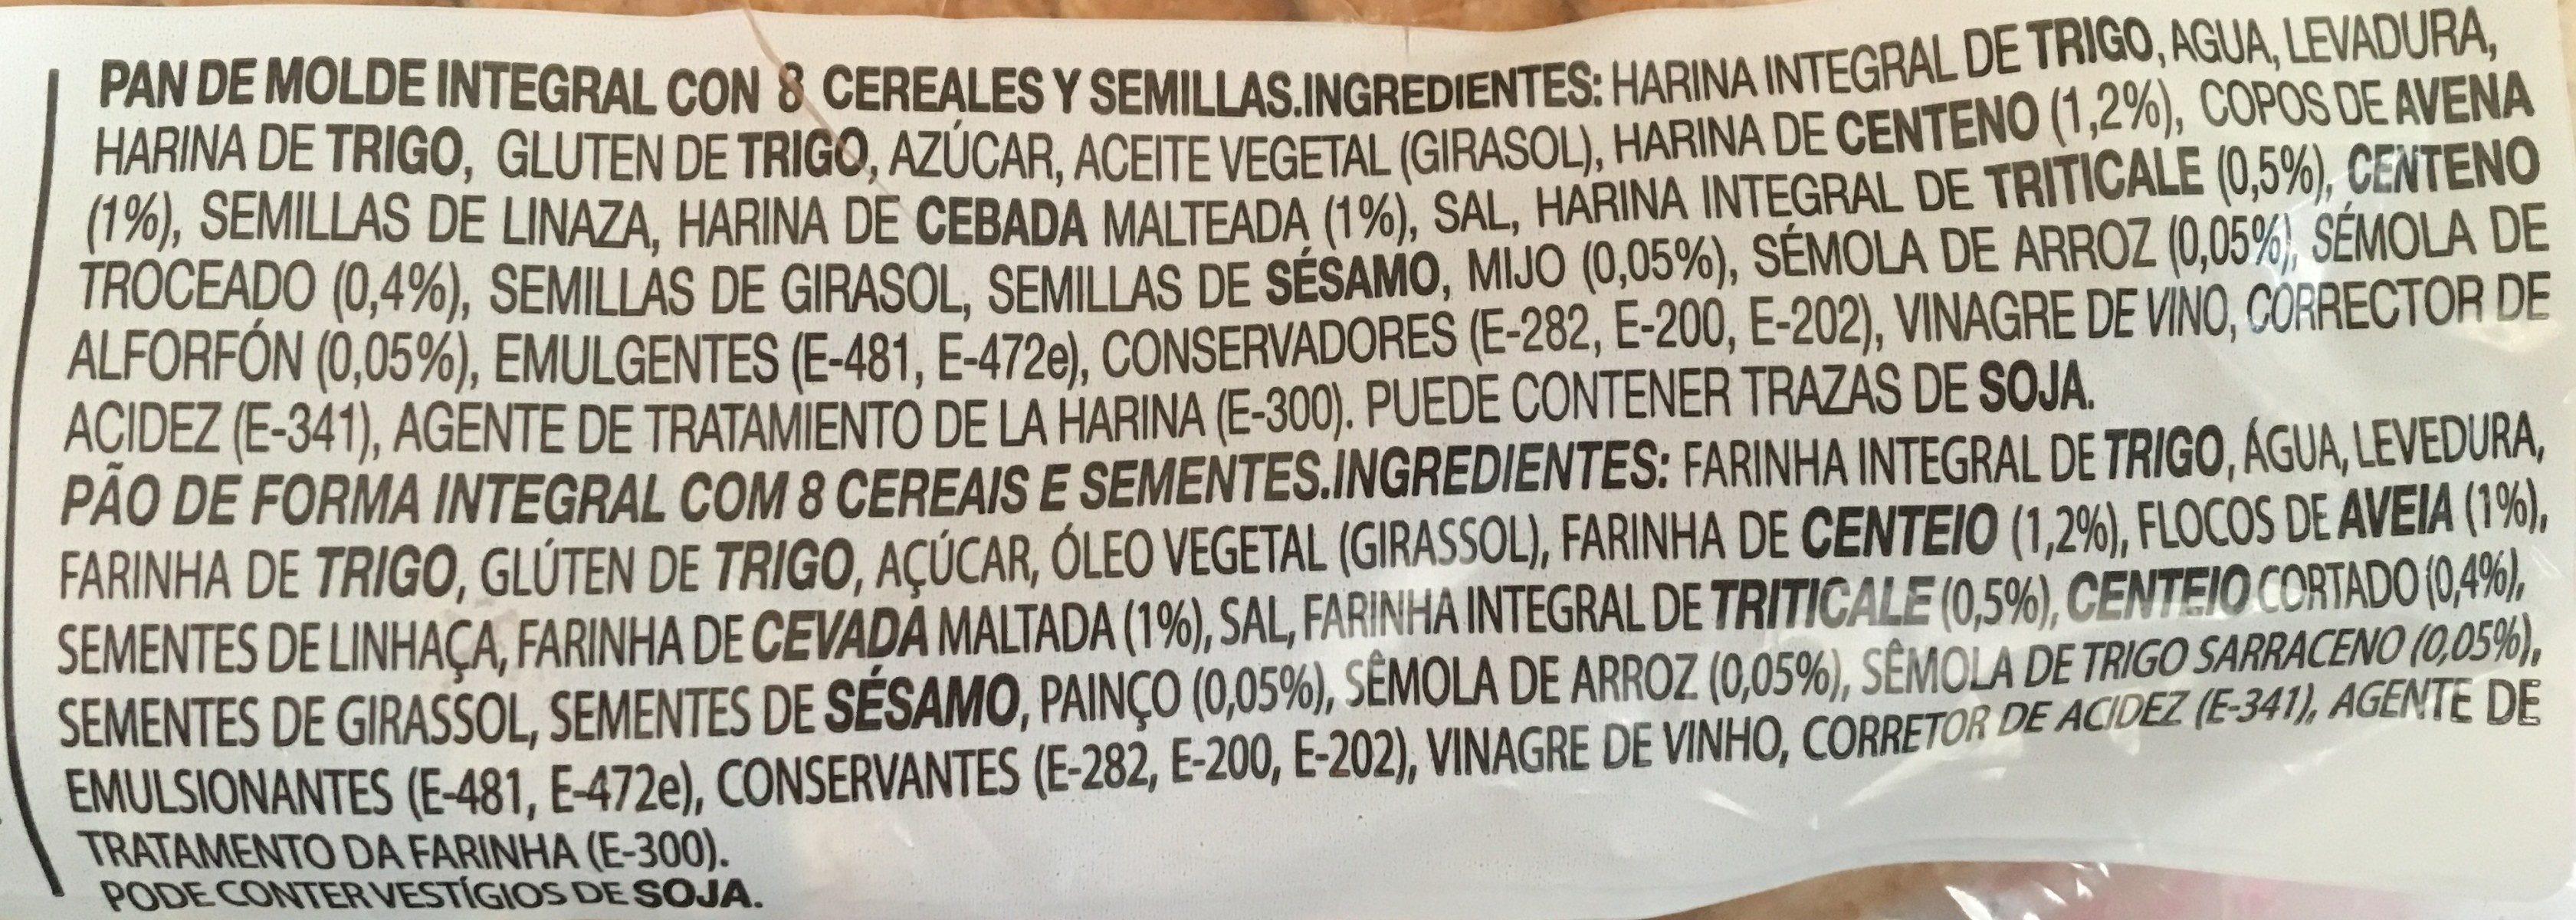 Silueta pan de molde integral cereales completo - Ingrédients - fr